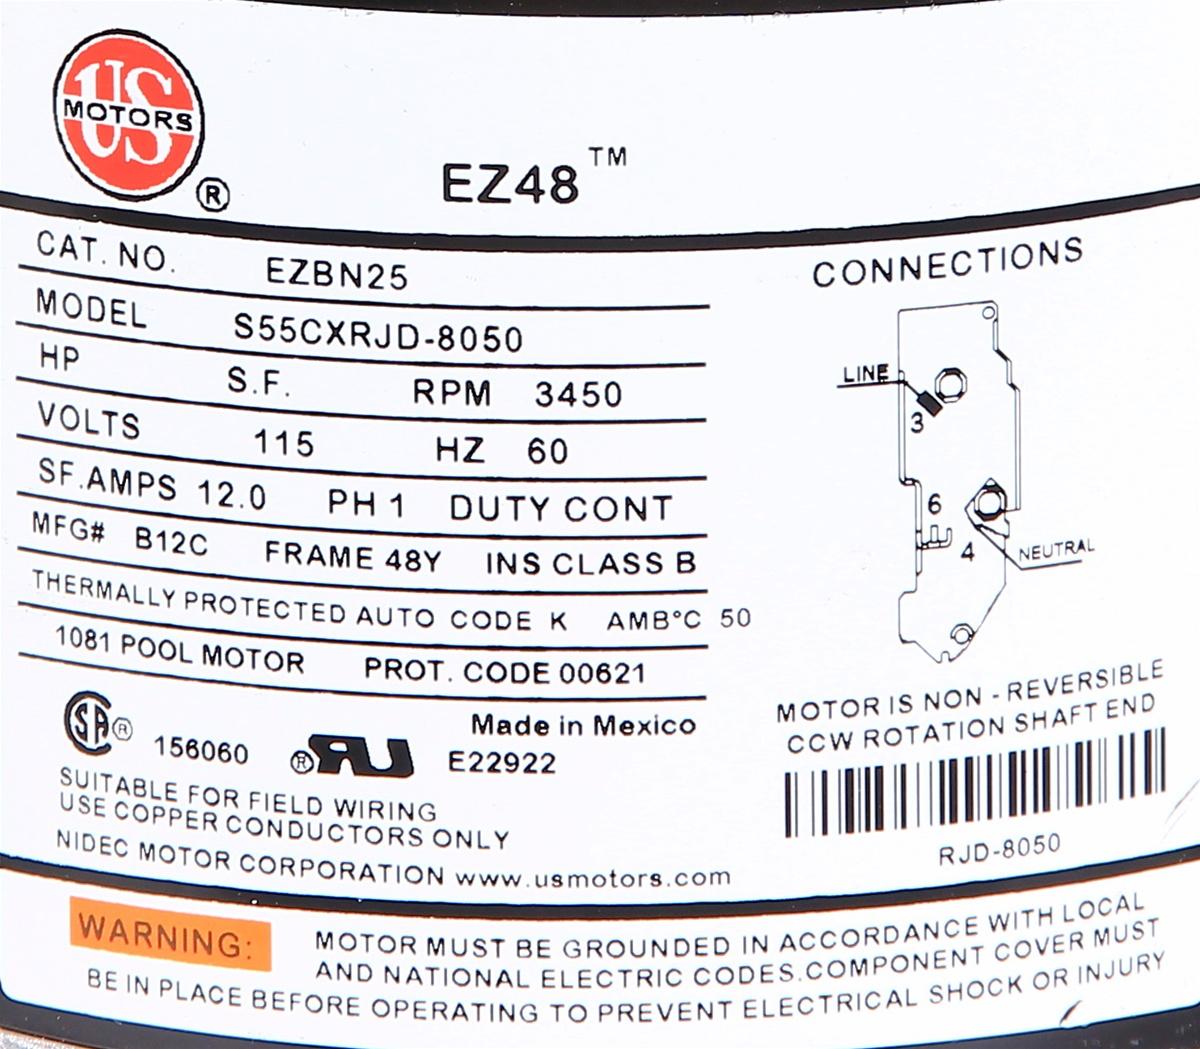 Puuf1003 Softub Pump 1013005 Soft Tub Pump